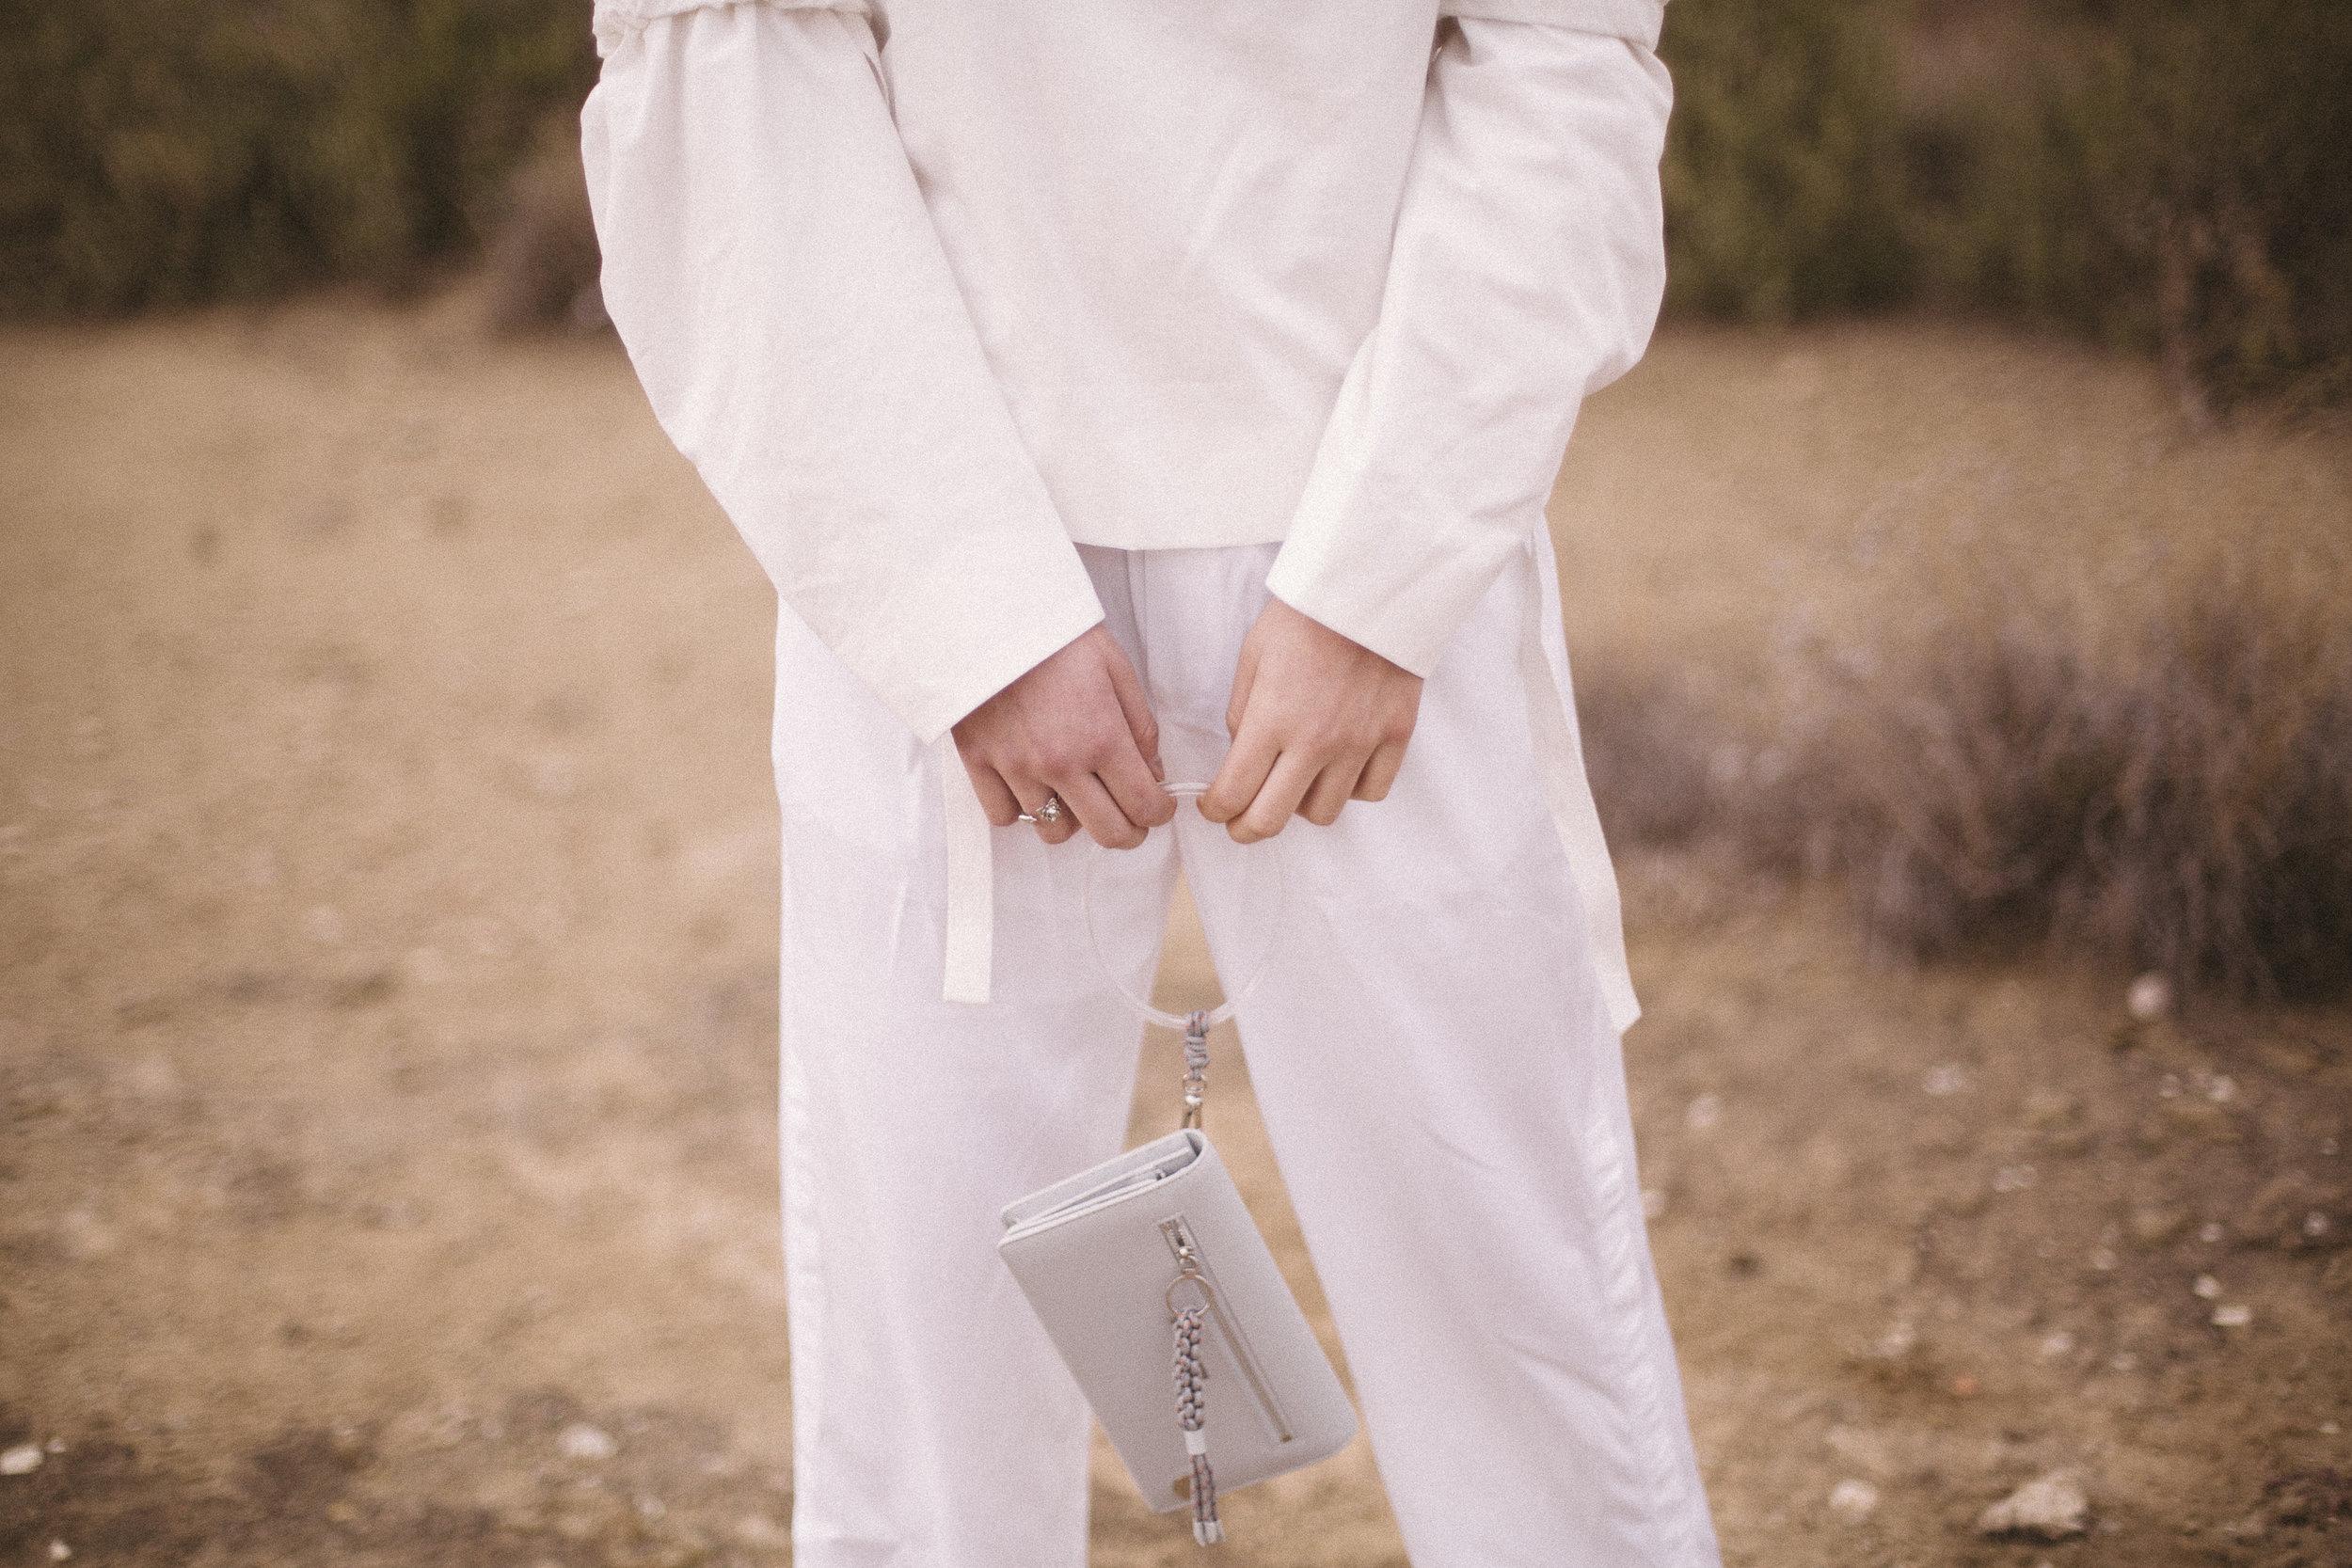 Top  COS  Trousers  FILIPPA K  Bag  C  HARLES AND KEITH